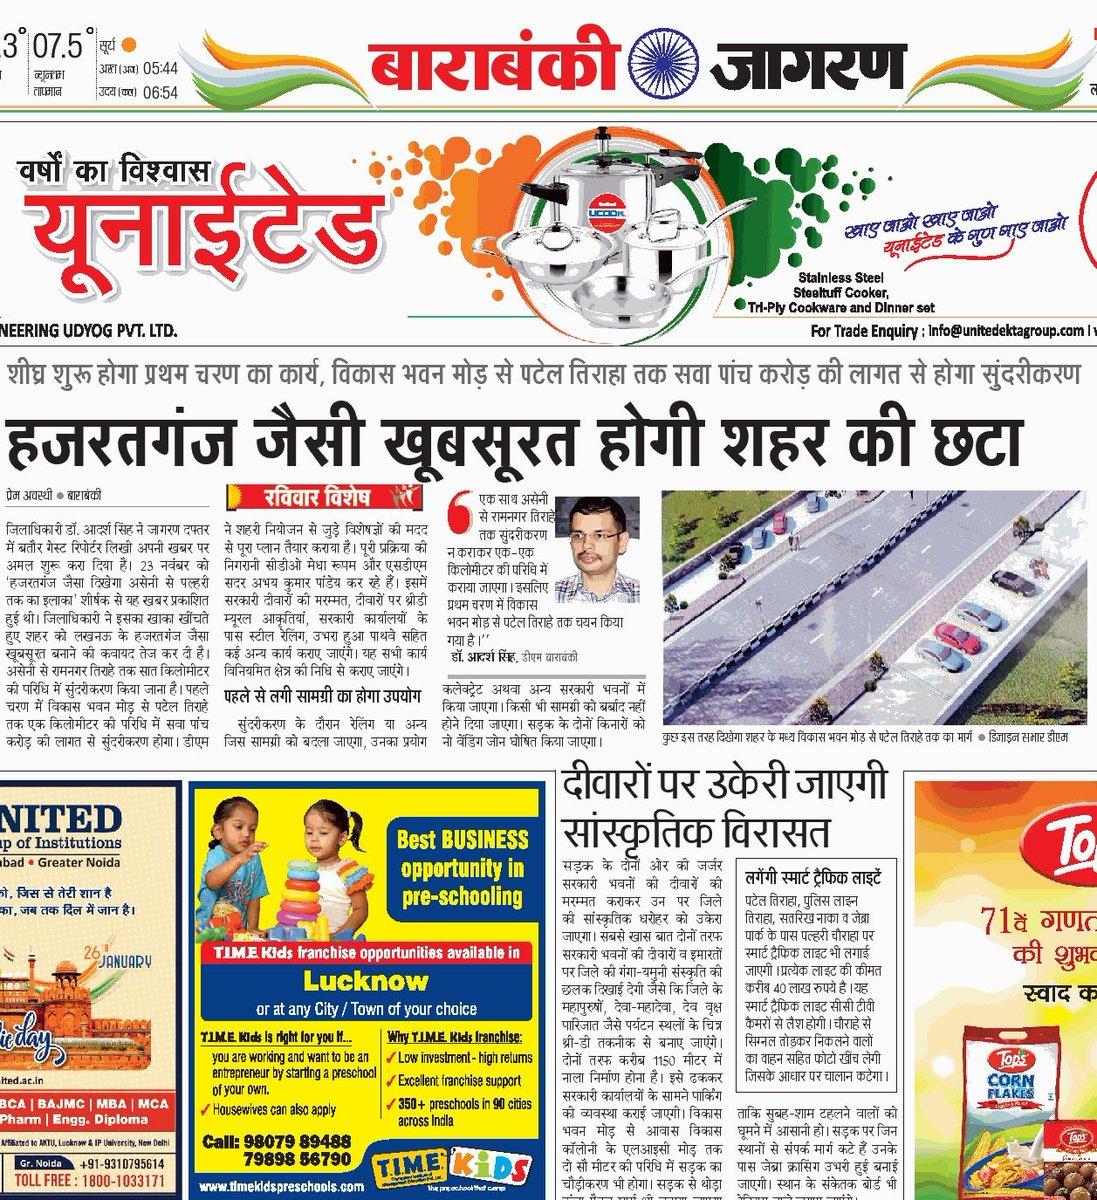 @JagranNews @SadguruSharan @BarabankiD  @upendrasinghMP#नगर विकास #vishesh #कायाकल्प